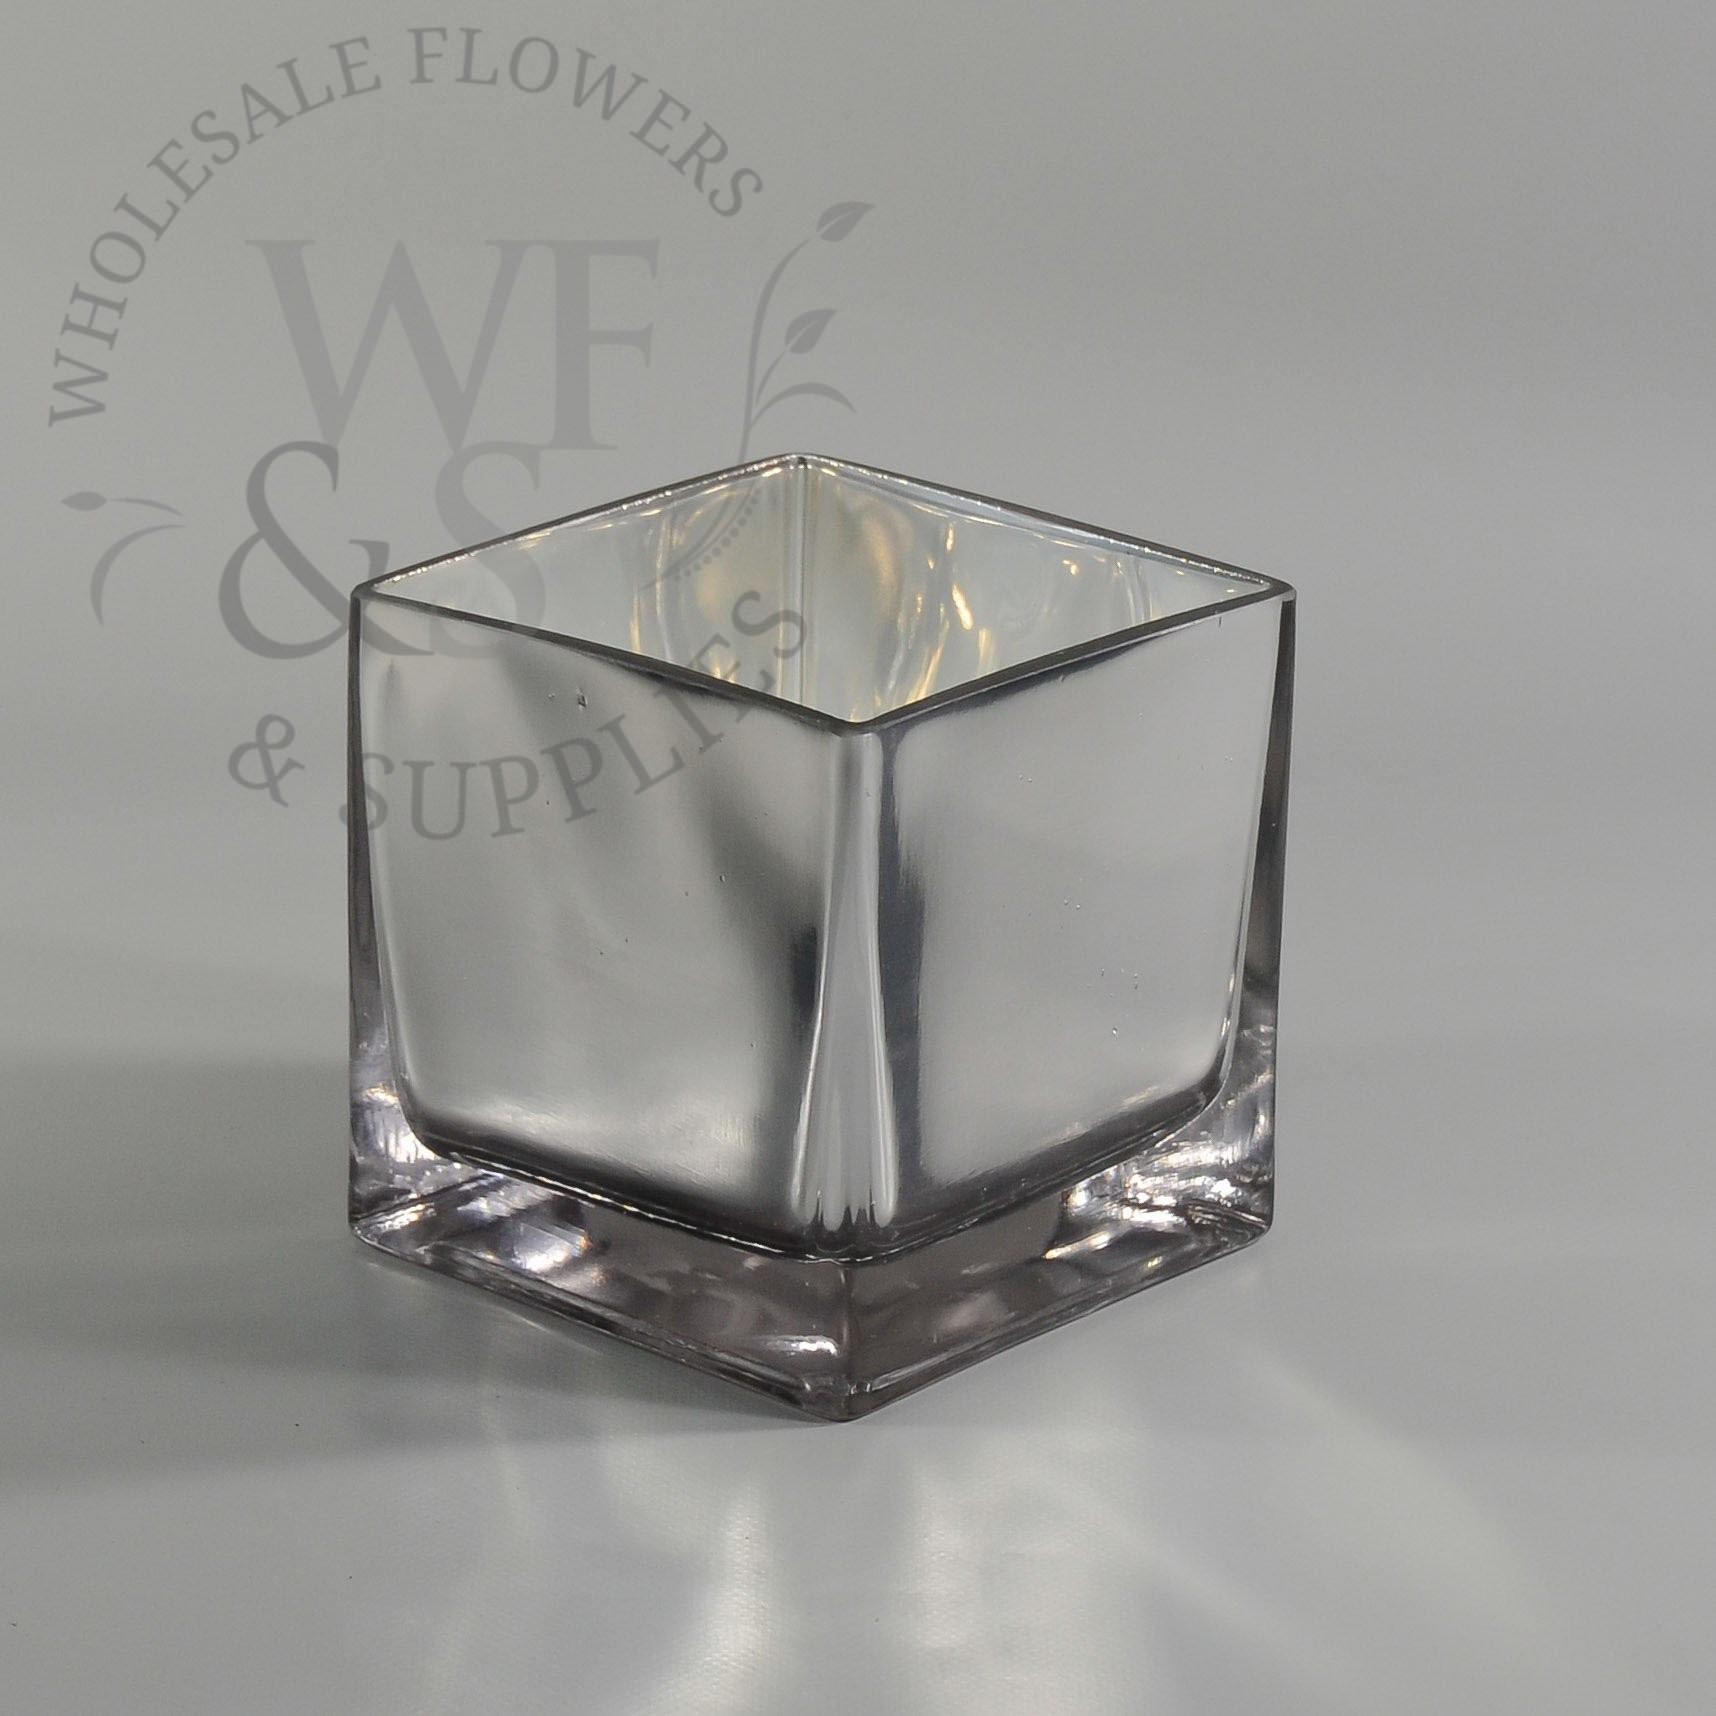 lalique vases on ebay of 13 fresh silver mirror vase bogekompresorturkiye com in crystal mirror inspirational mirror vase 8 1h vases mirrored square cube riser inch squarei 0d uk